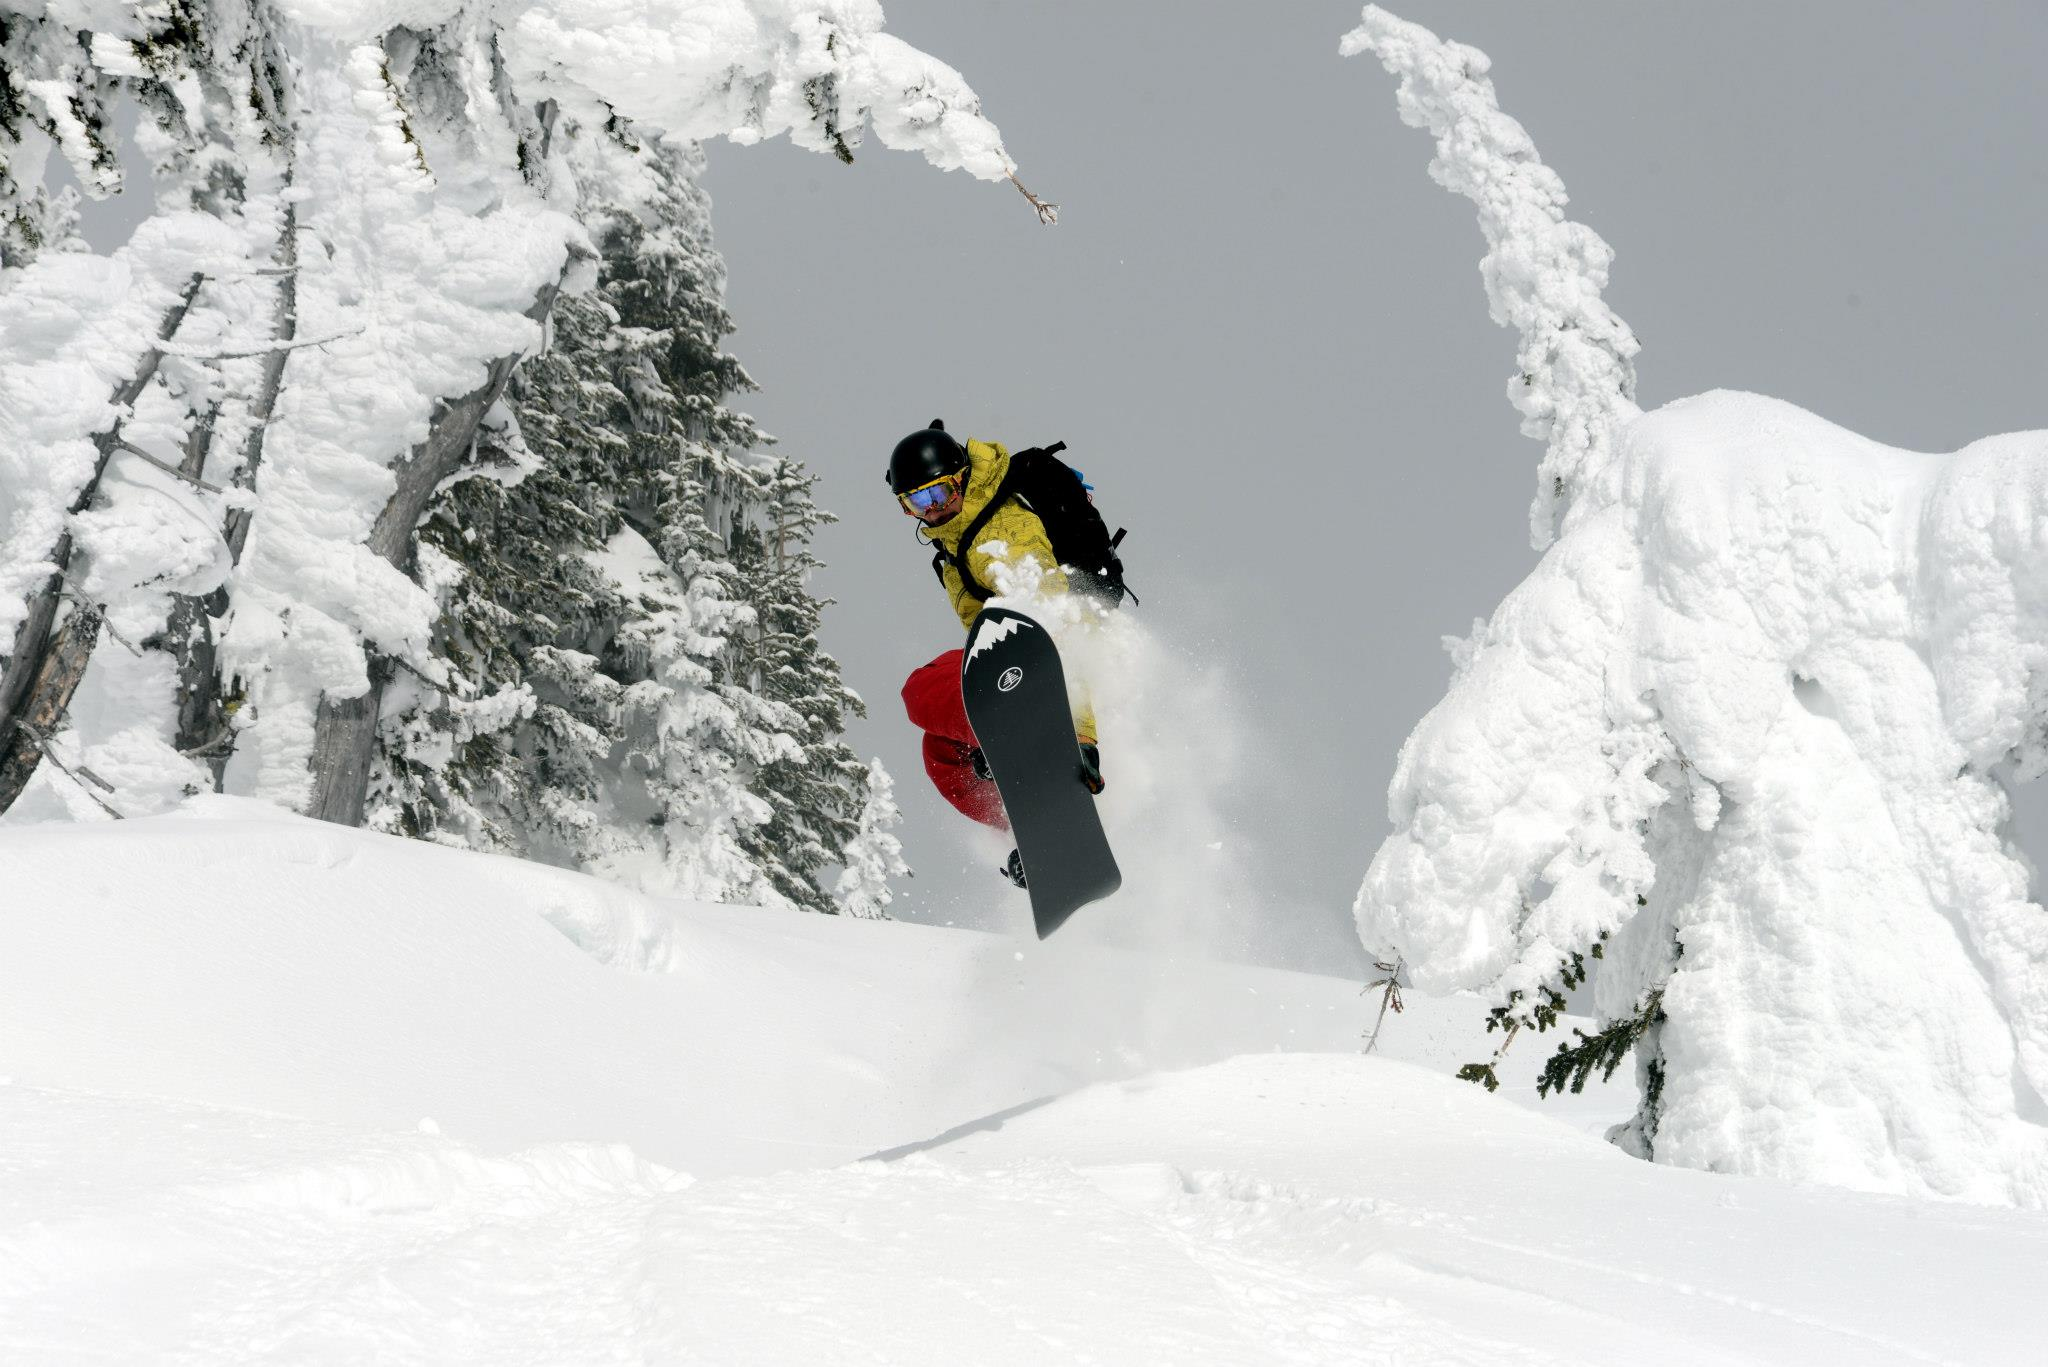 Snowboarder Catching Air, Selkirk Powder